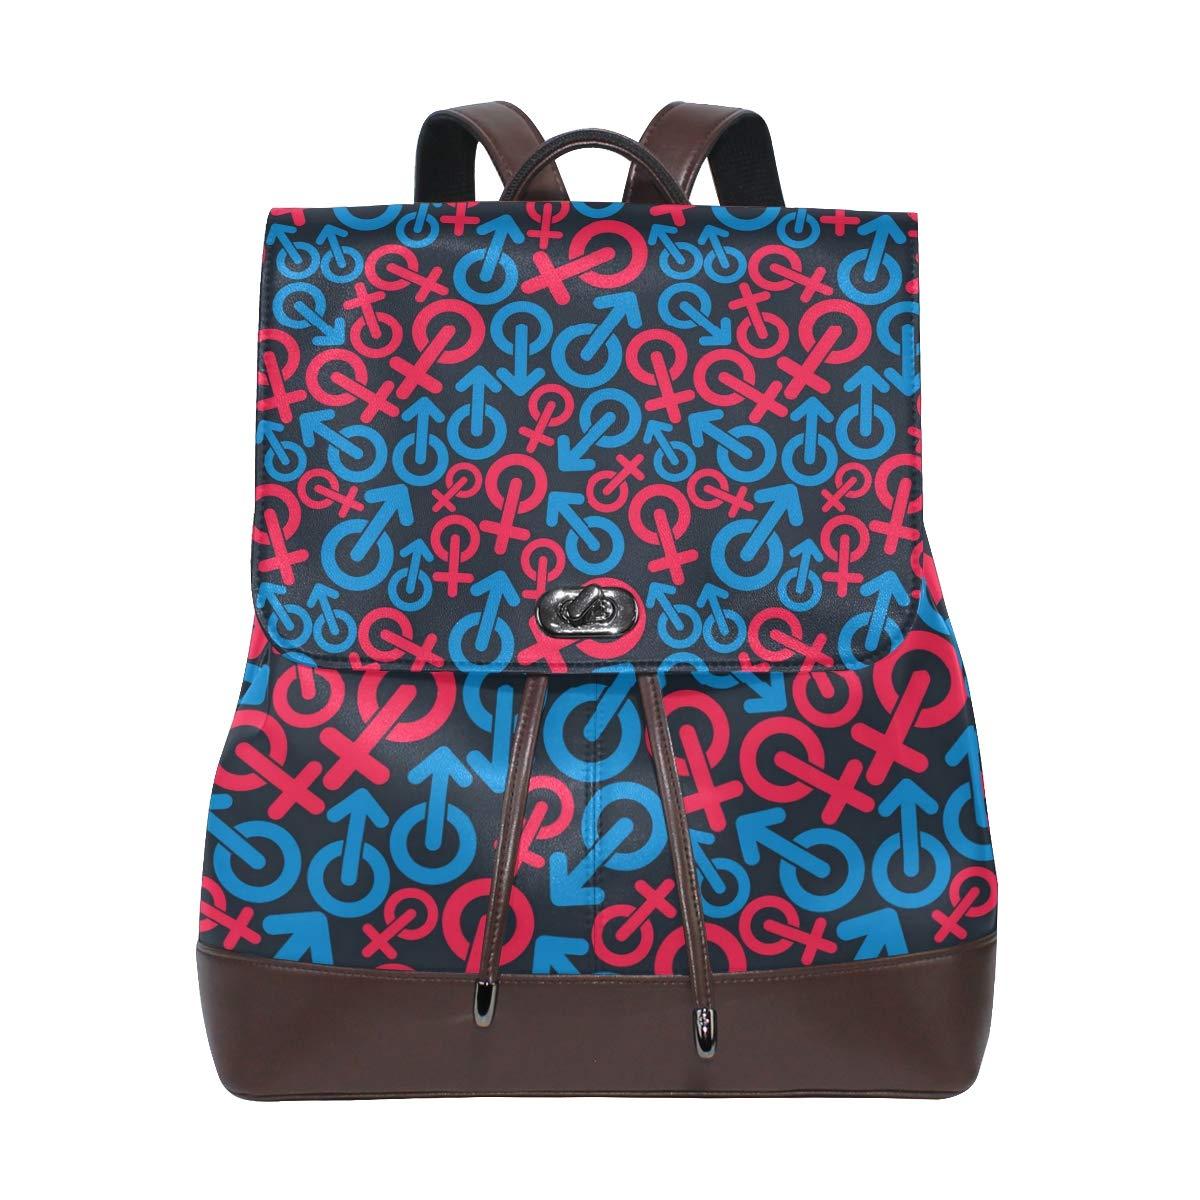 Leather fashion Gender Symbols Sexual backpack For Work//Travel//Leisure//school bag